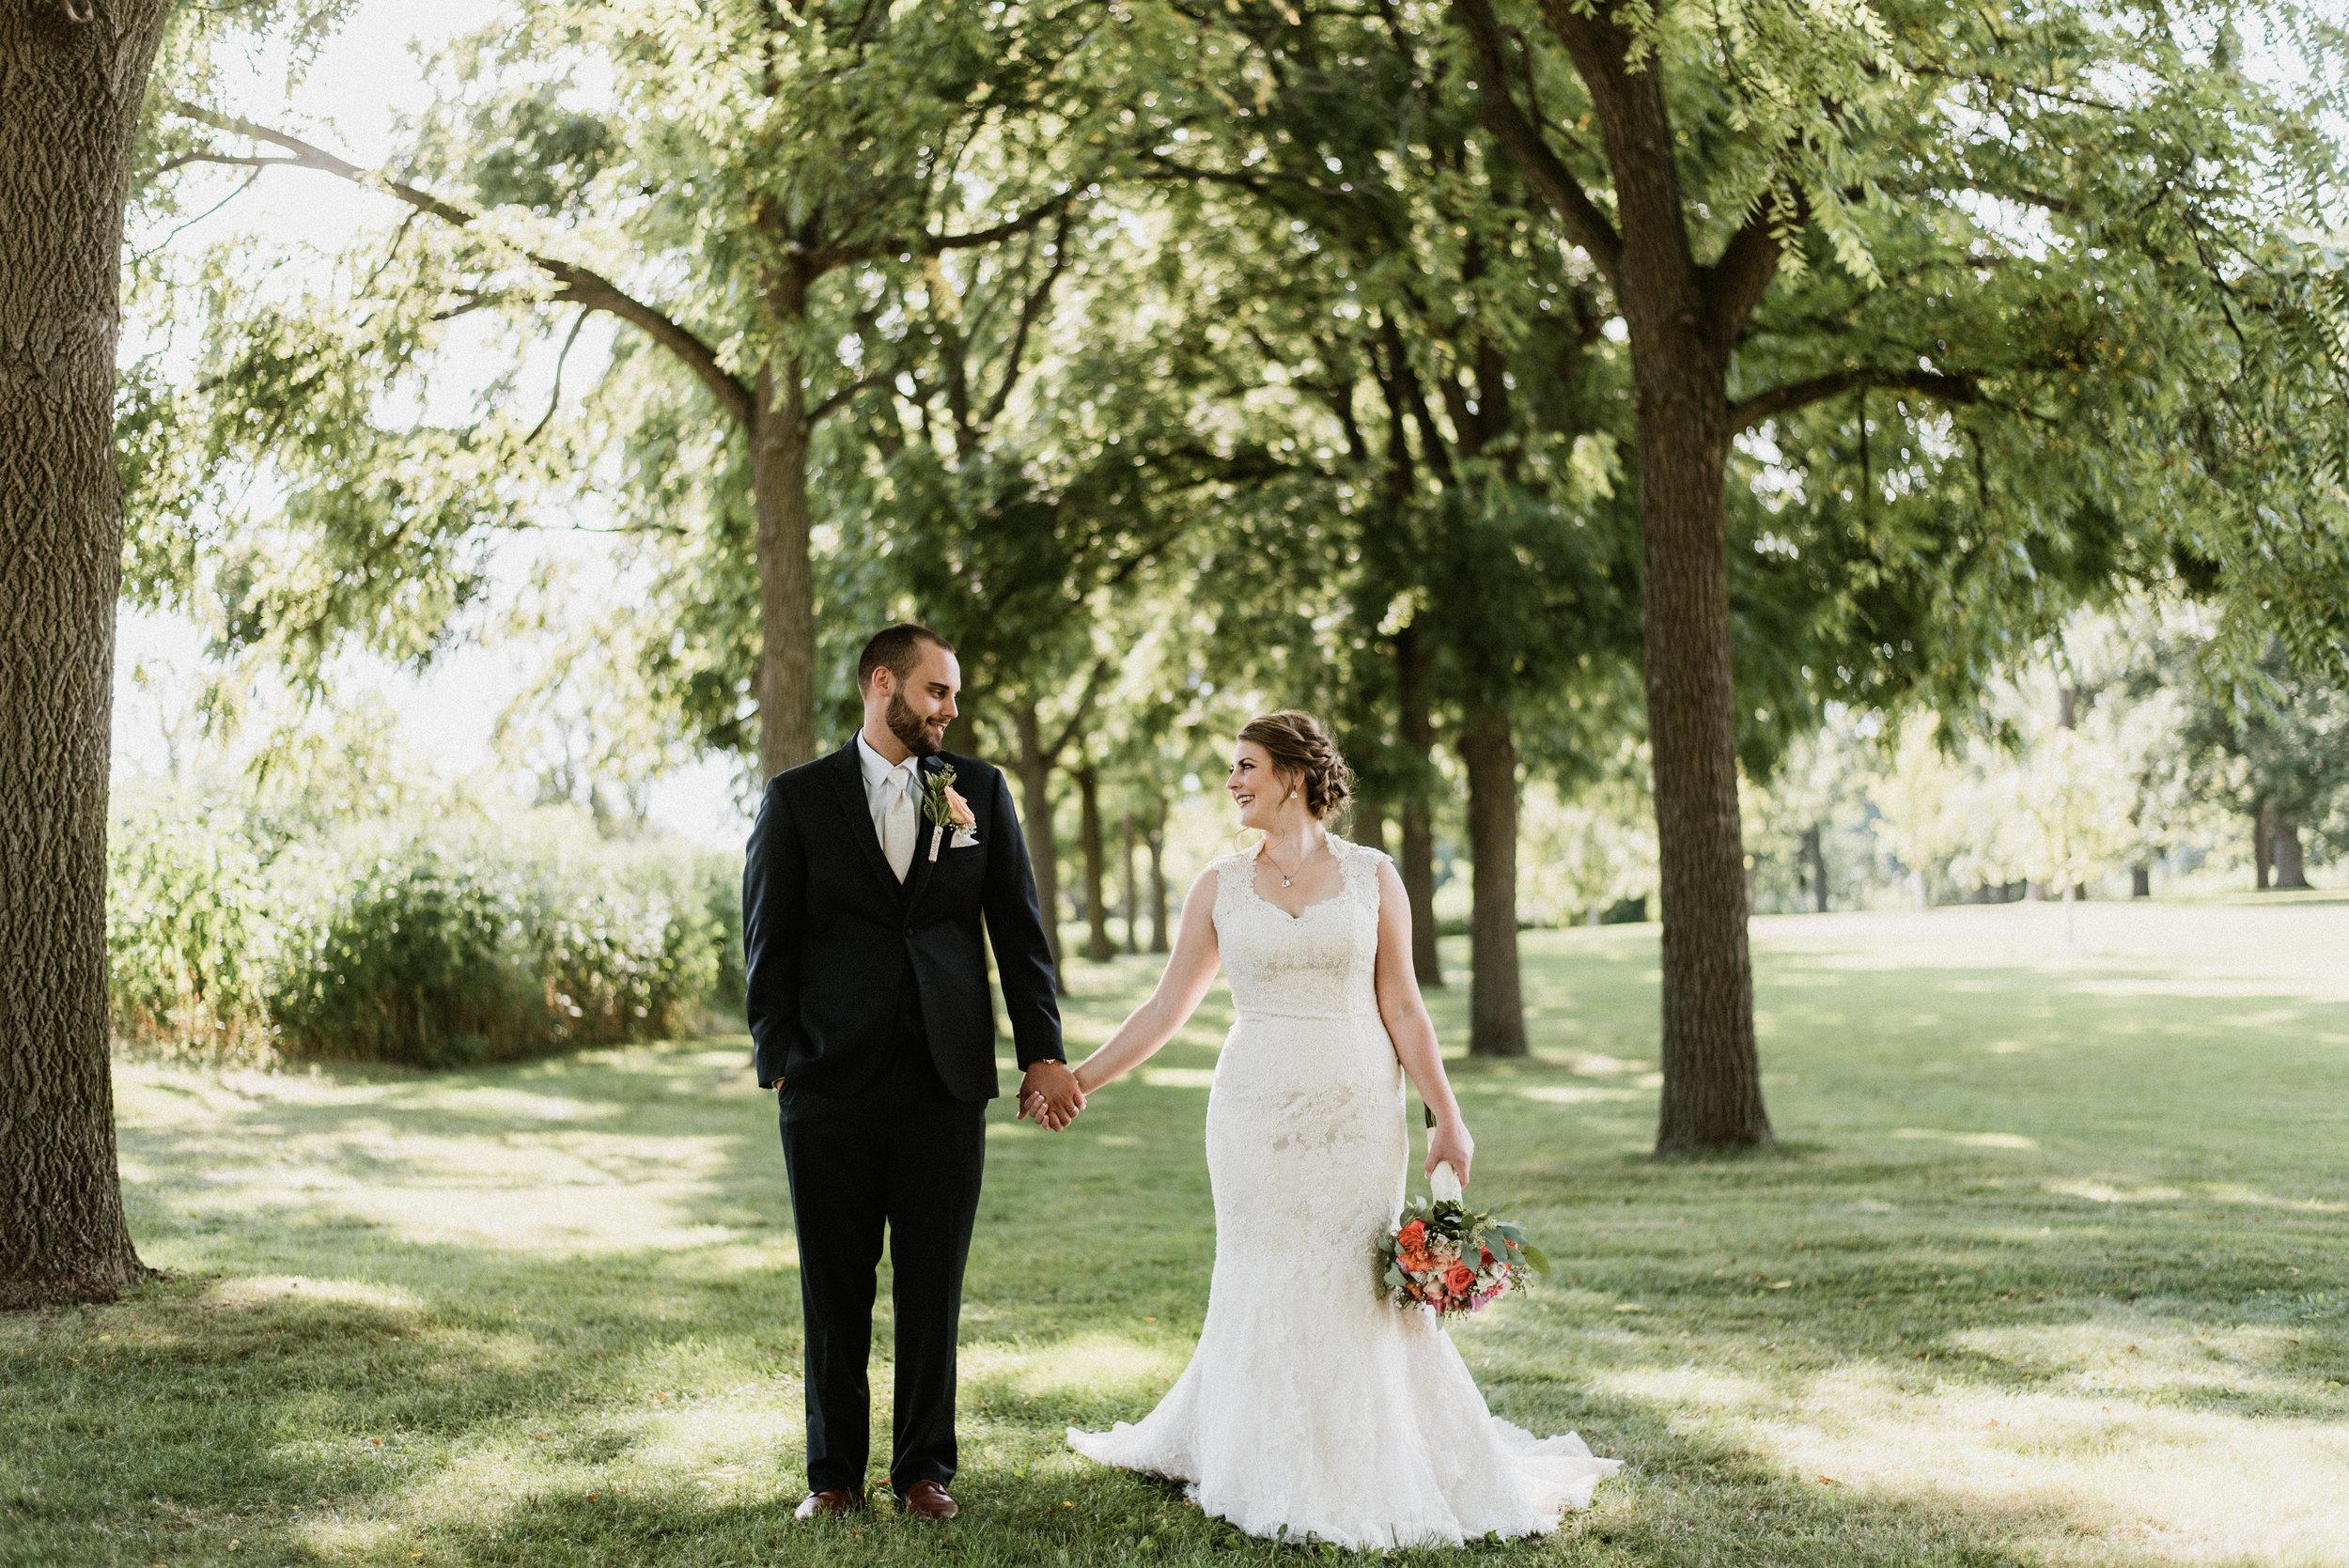 Jenny and Mike - Classic Summer Wedding | St. Michael's Catholic Church & Arrowhead Golf Course | Wheaton, IL | Naperville Wedding Photographer